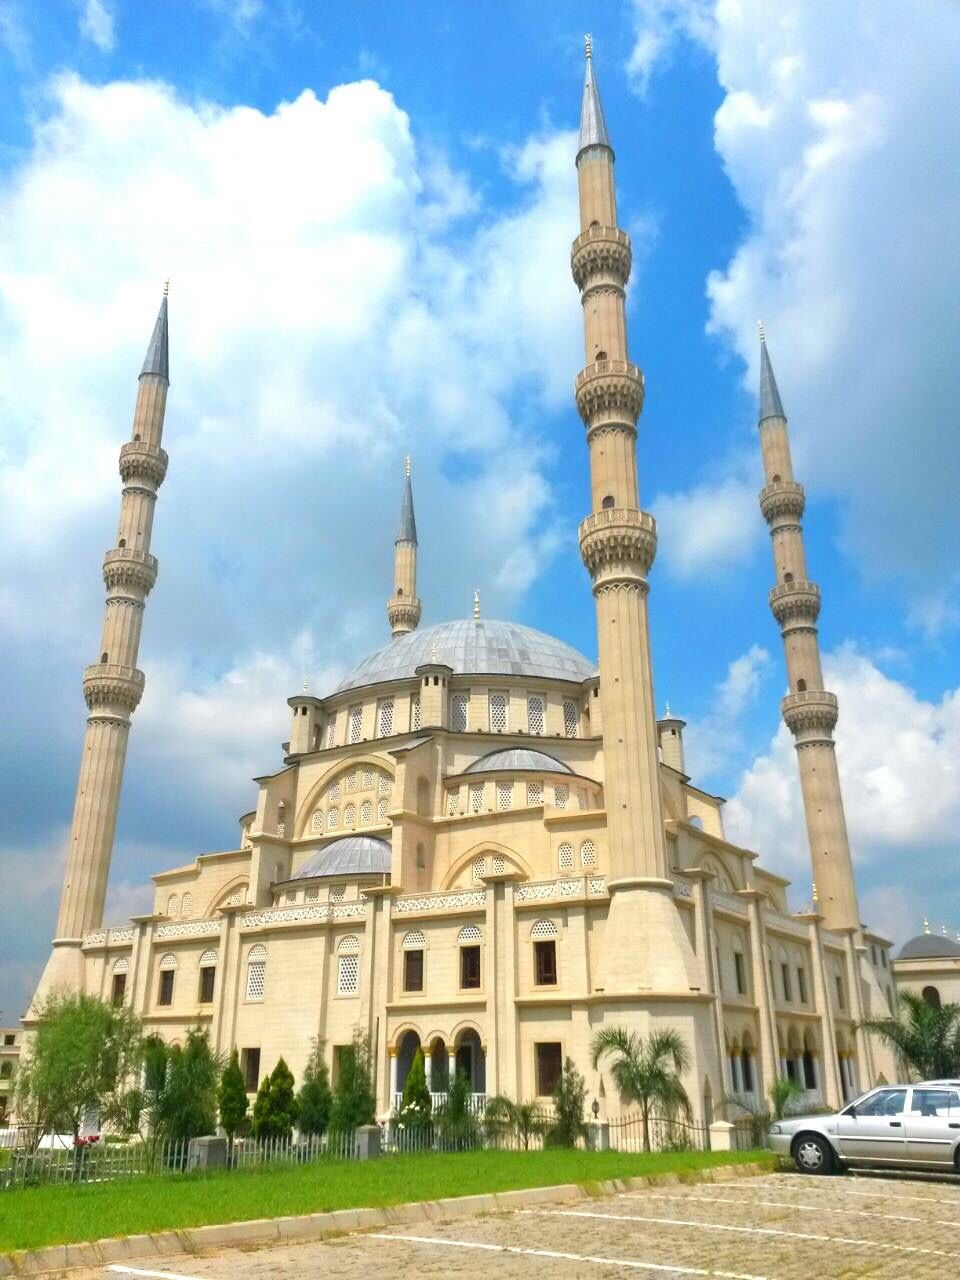 South Africa Midrand Nizamiye Mosque